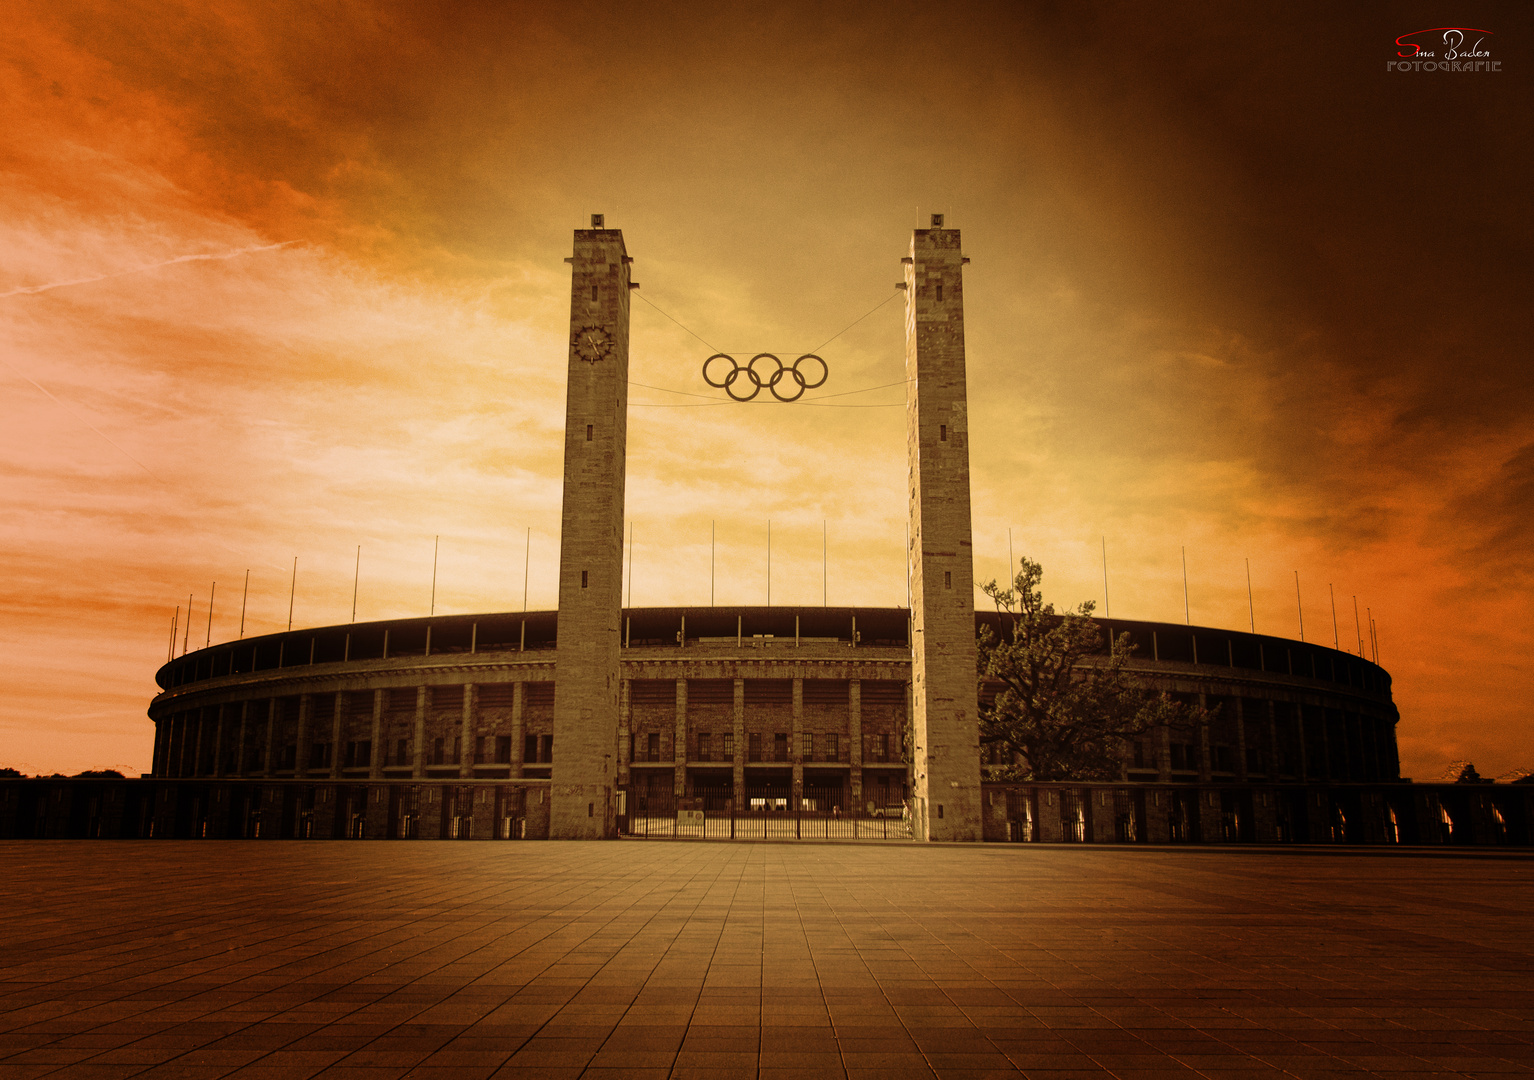 Olympiastadion Berlin - Germany